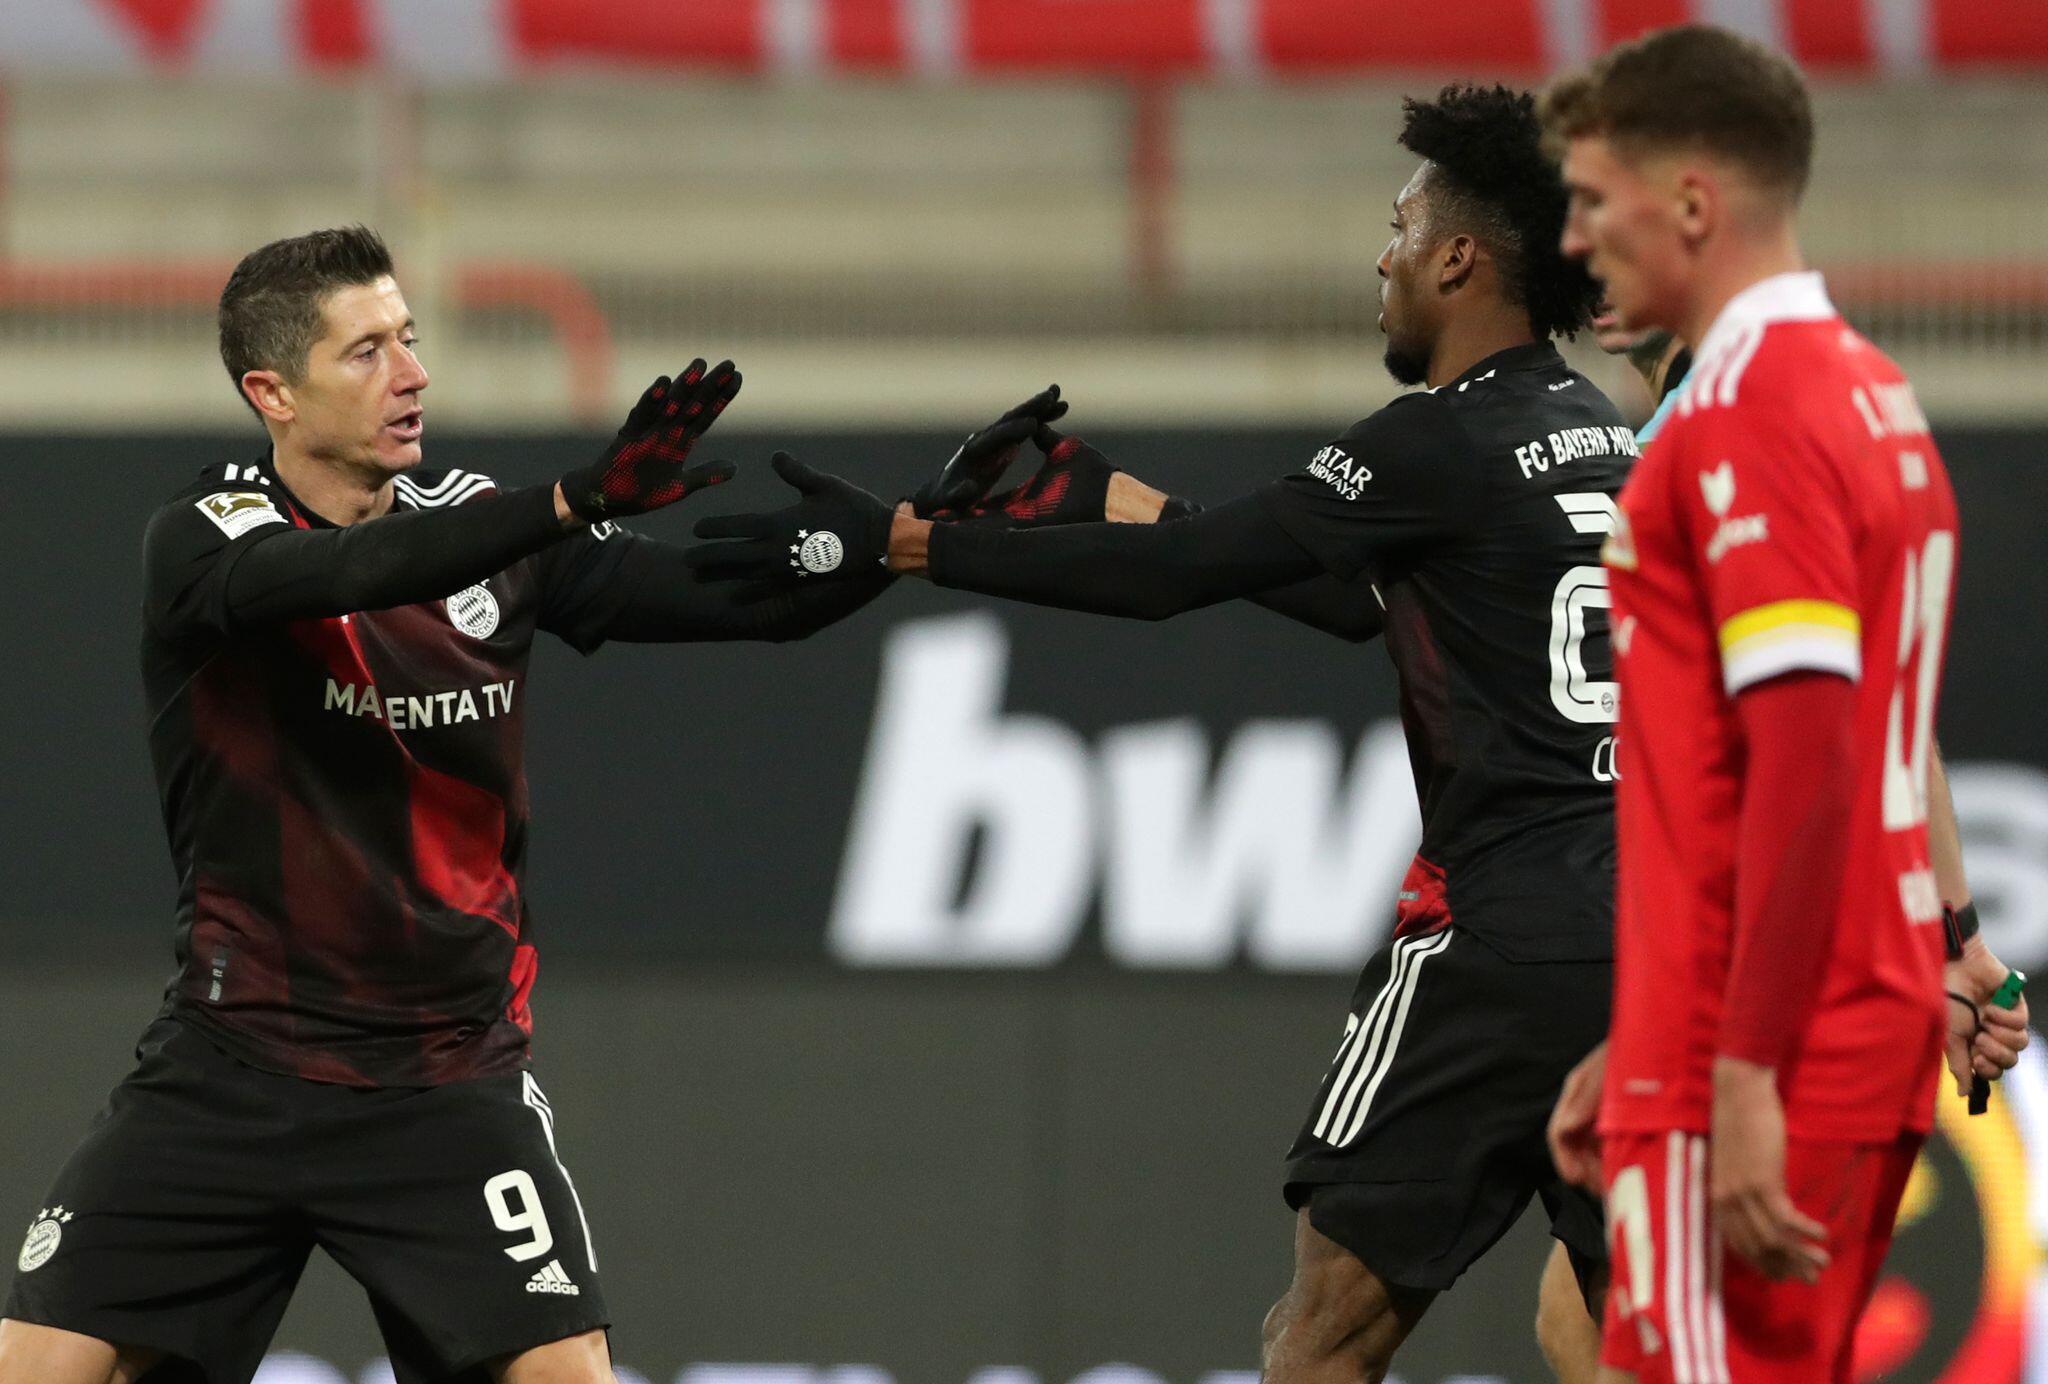 Bild zu 1. FC Union Berlin - FC Bayern München